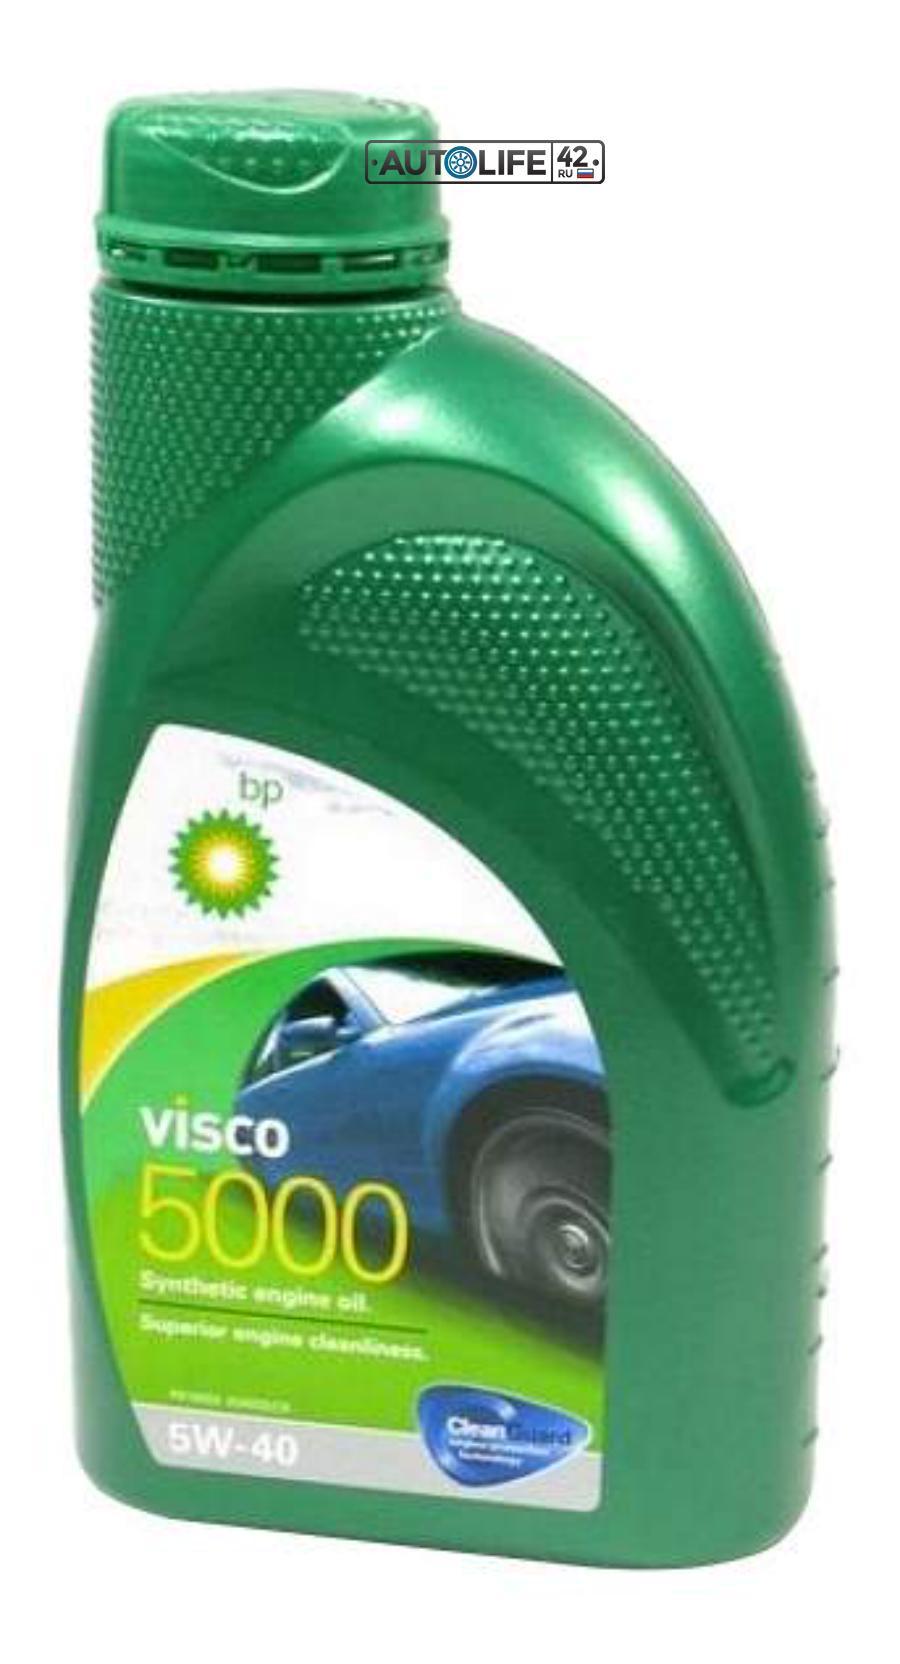 Масло моторное синтетическое Visco 5000 5W-40, 1л